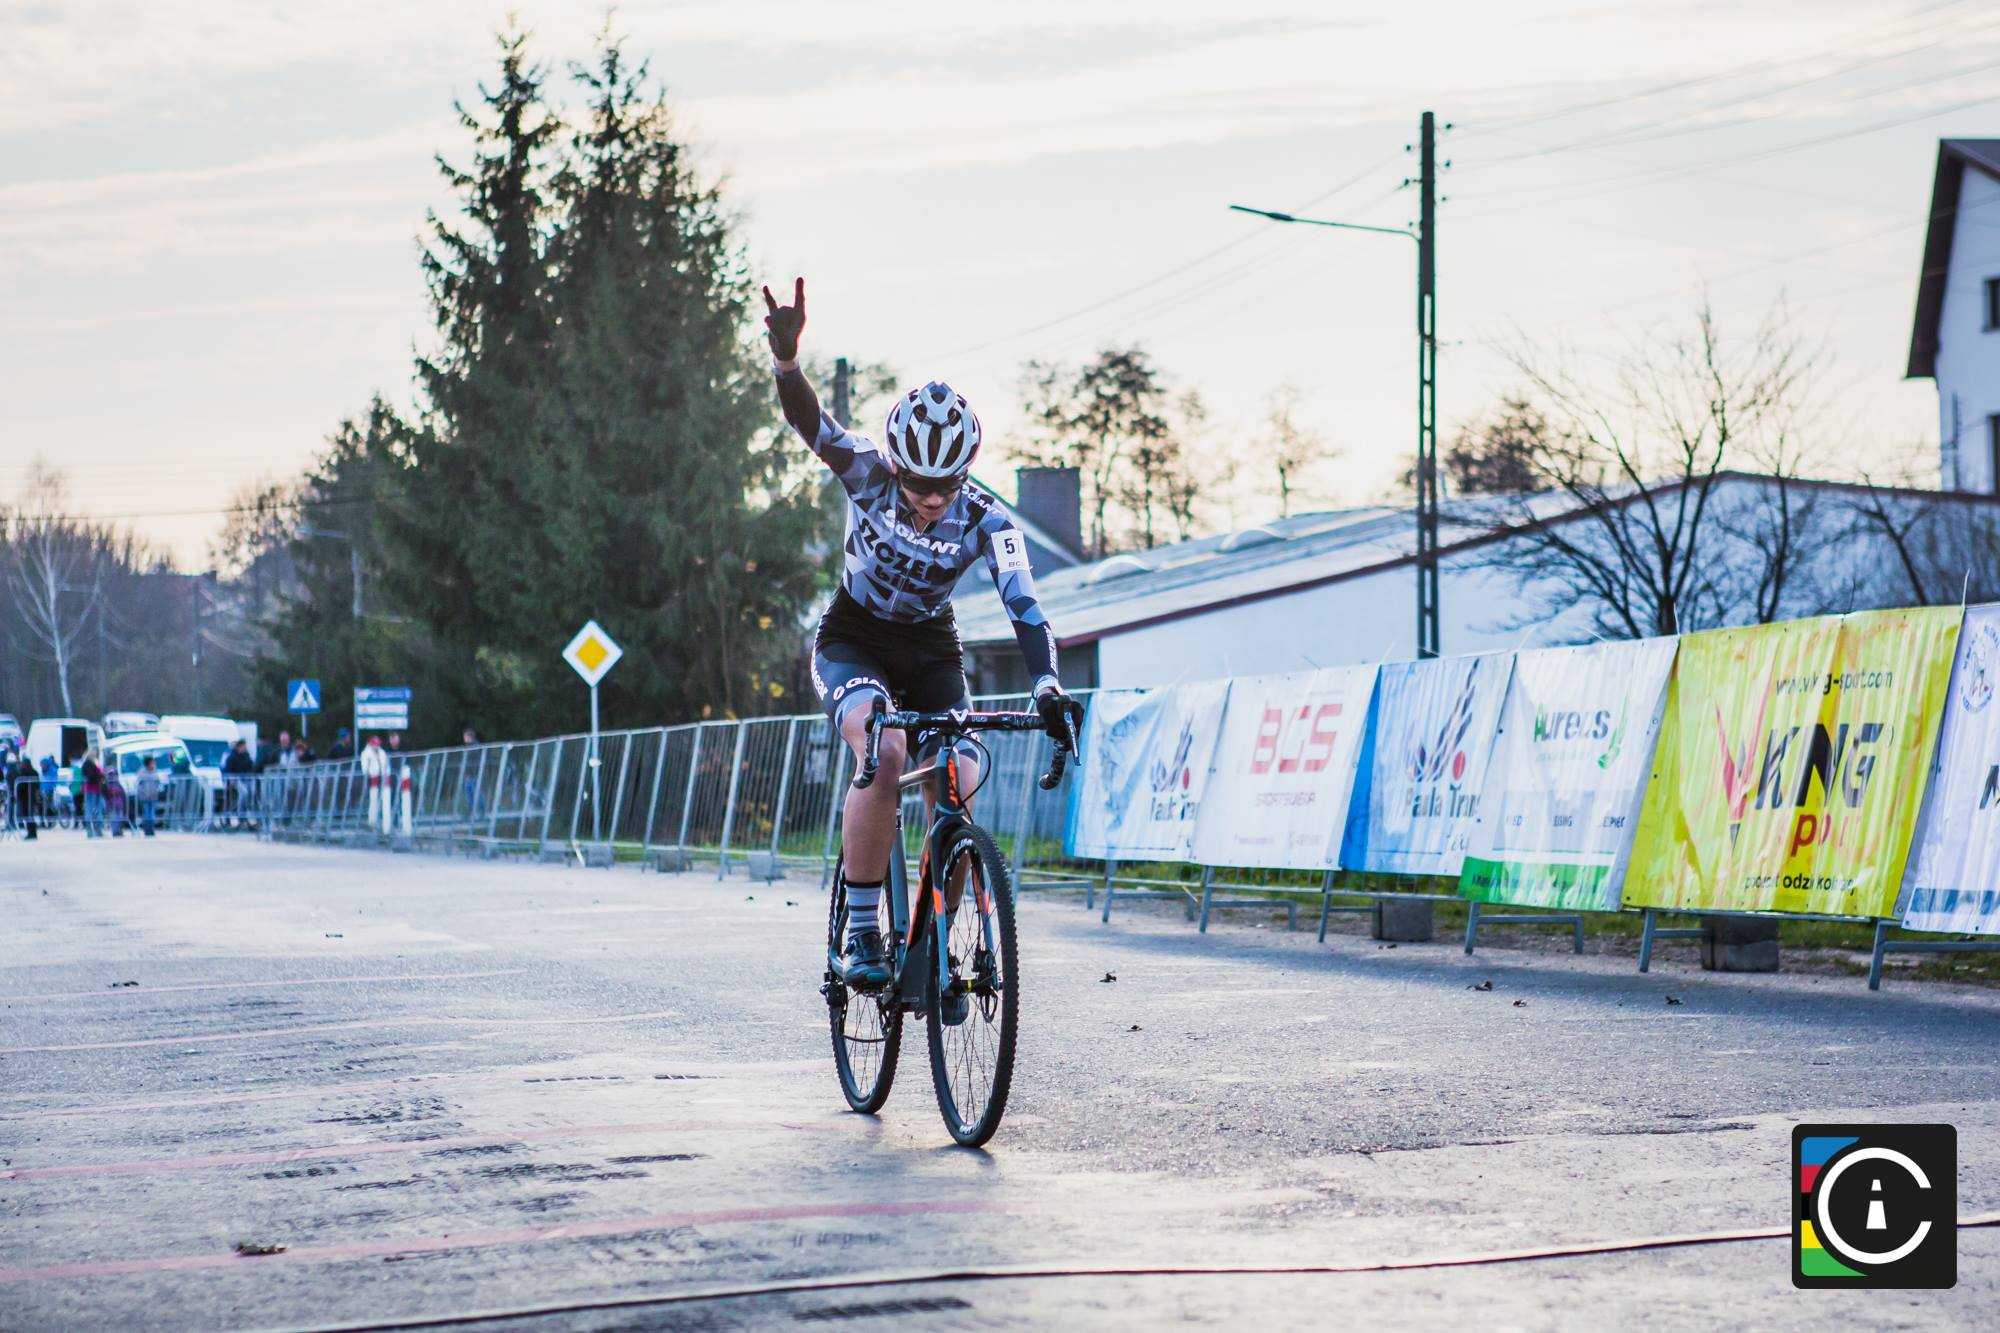 Barbara Borowiecka (PrinzWear Szczepan Bike) – Toi Toi Cup / Super Puchar Polski